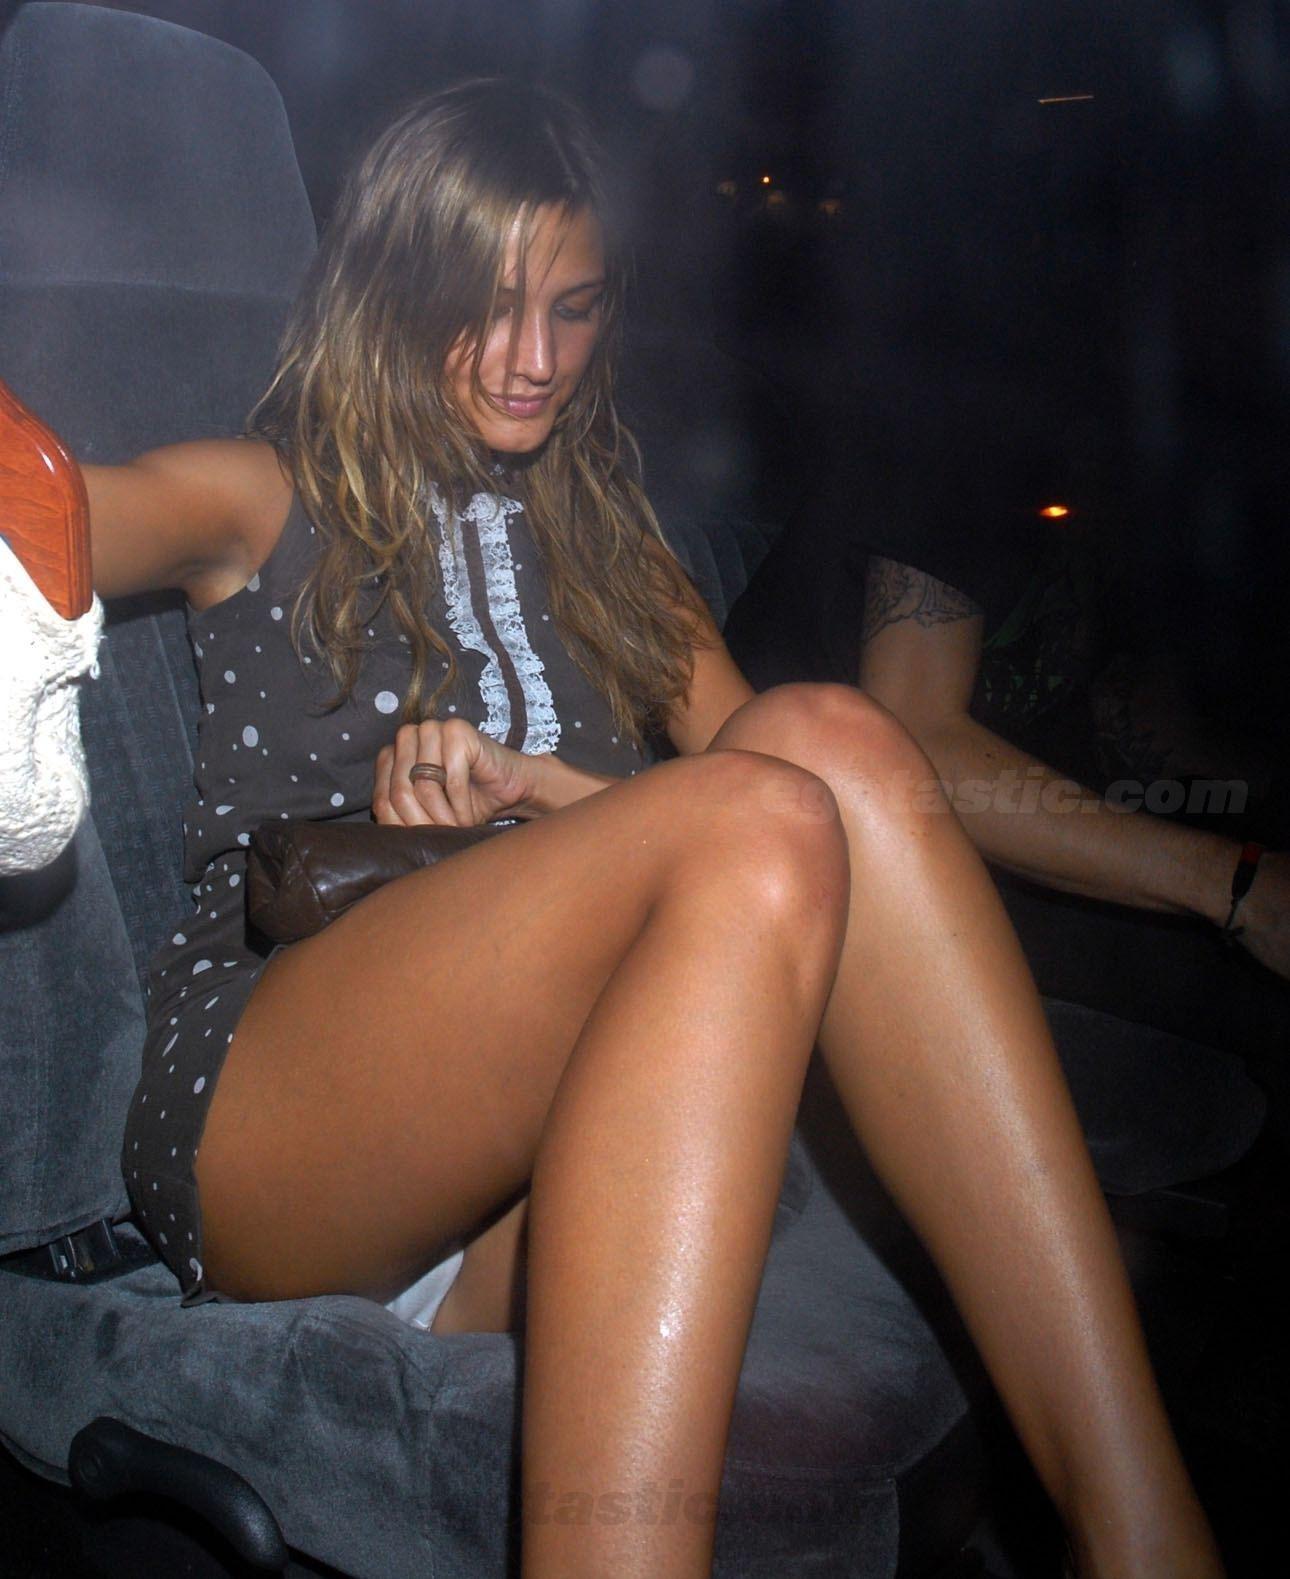 Adriana Cernanova Nude Photos. 2018-2019 celebrityes photos leaks!,Lily mcmenamy nude and fappening 27 Photos XXX images Hot photos of charli xcx,Nora mork bilder